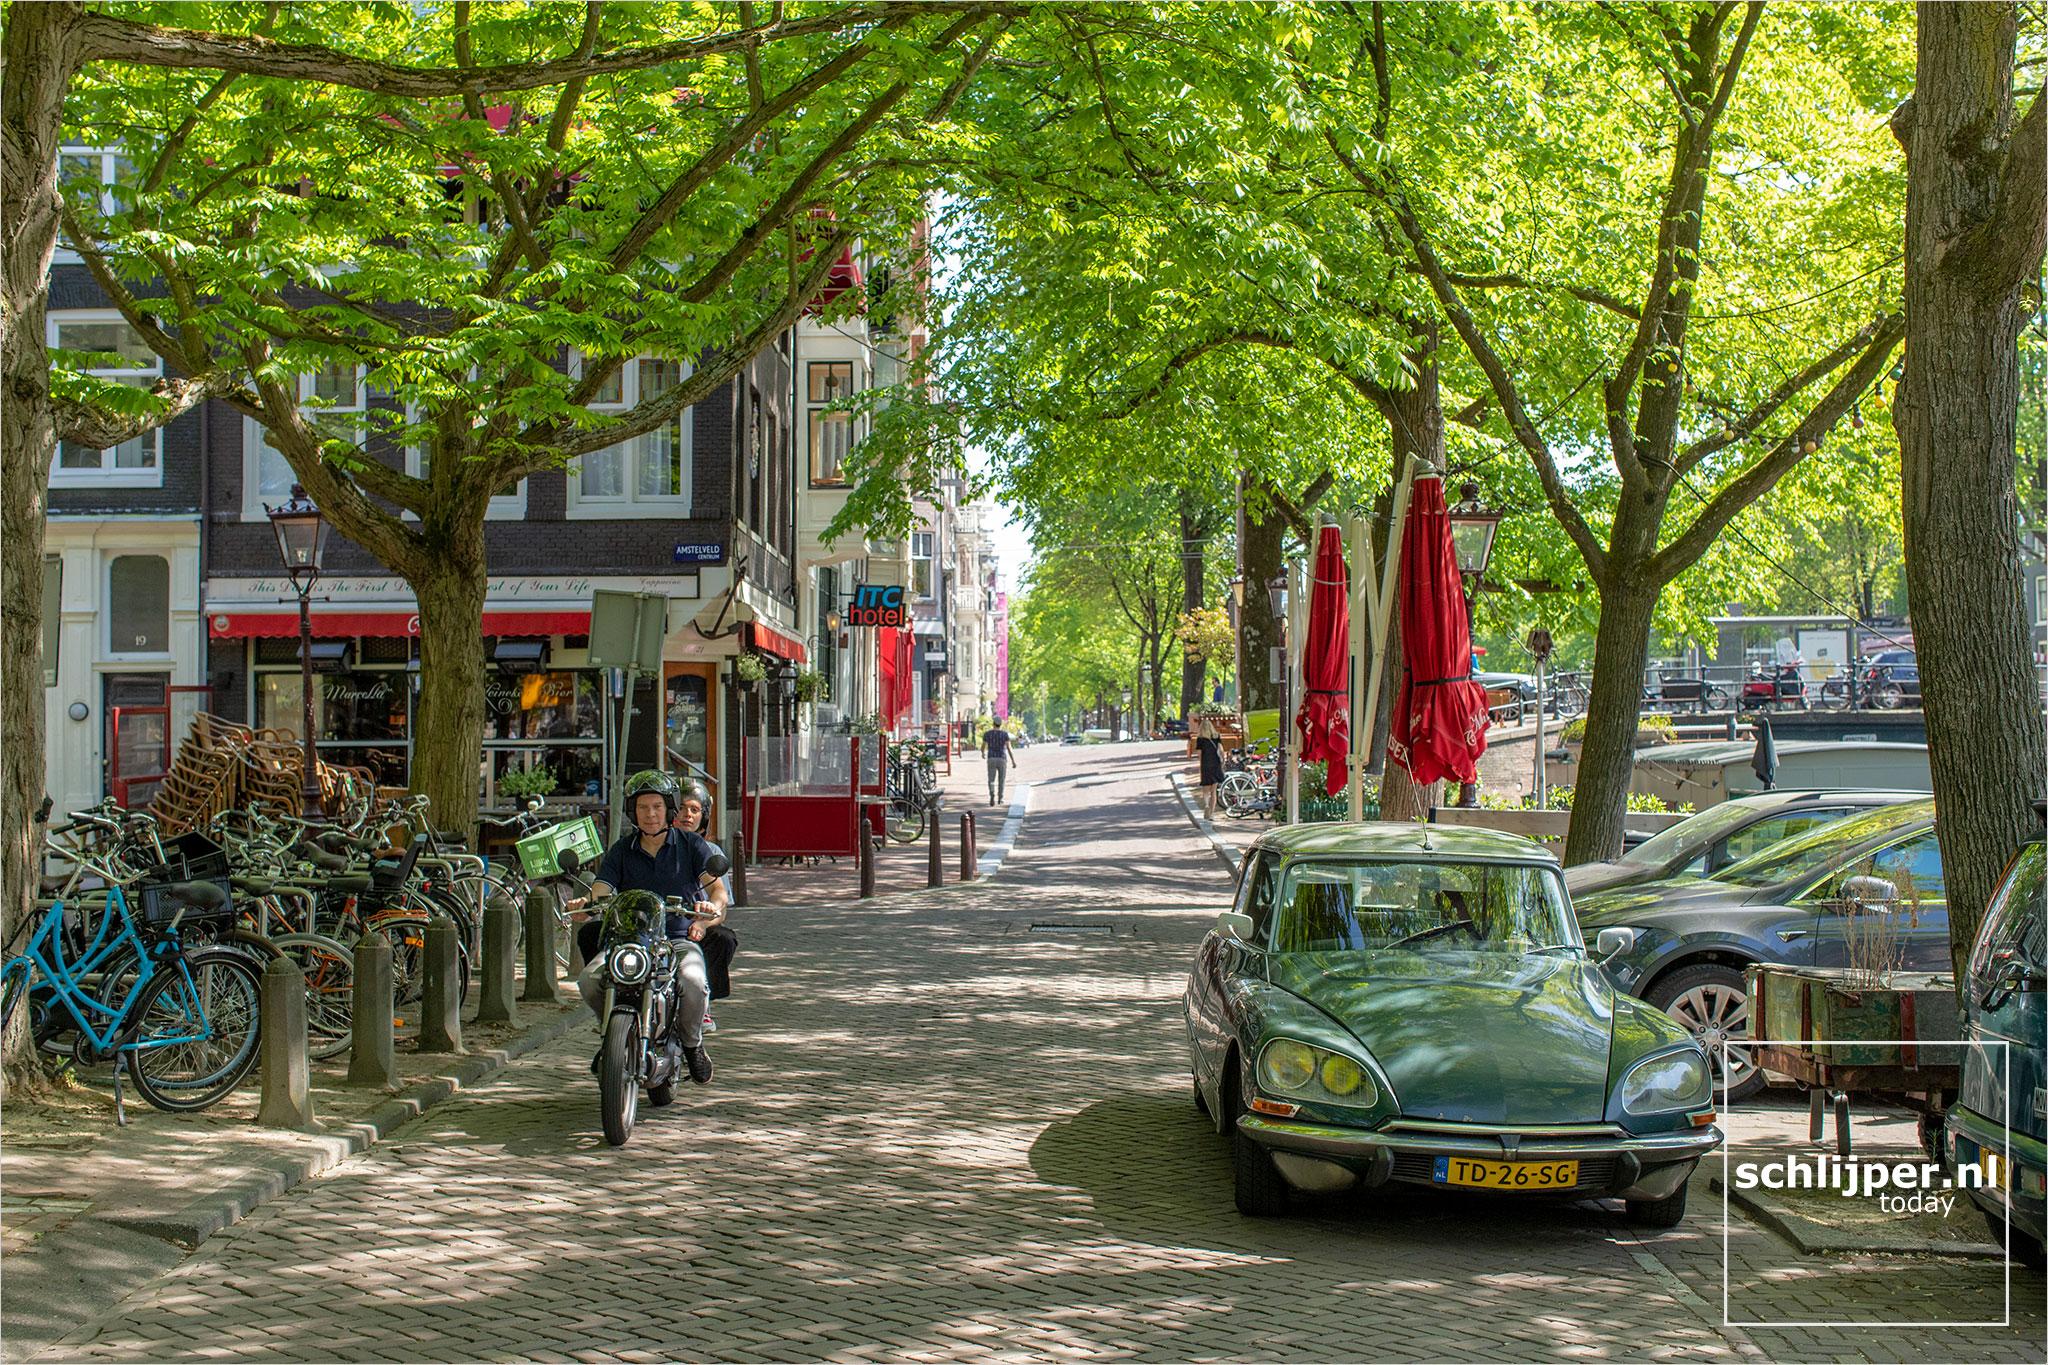 Nederland, Amsterdam, 9 mei 2020